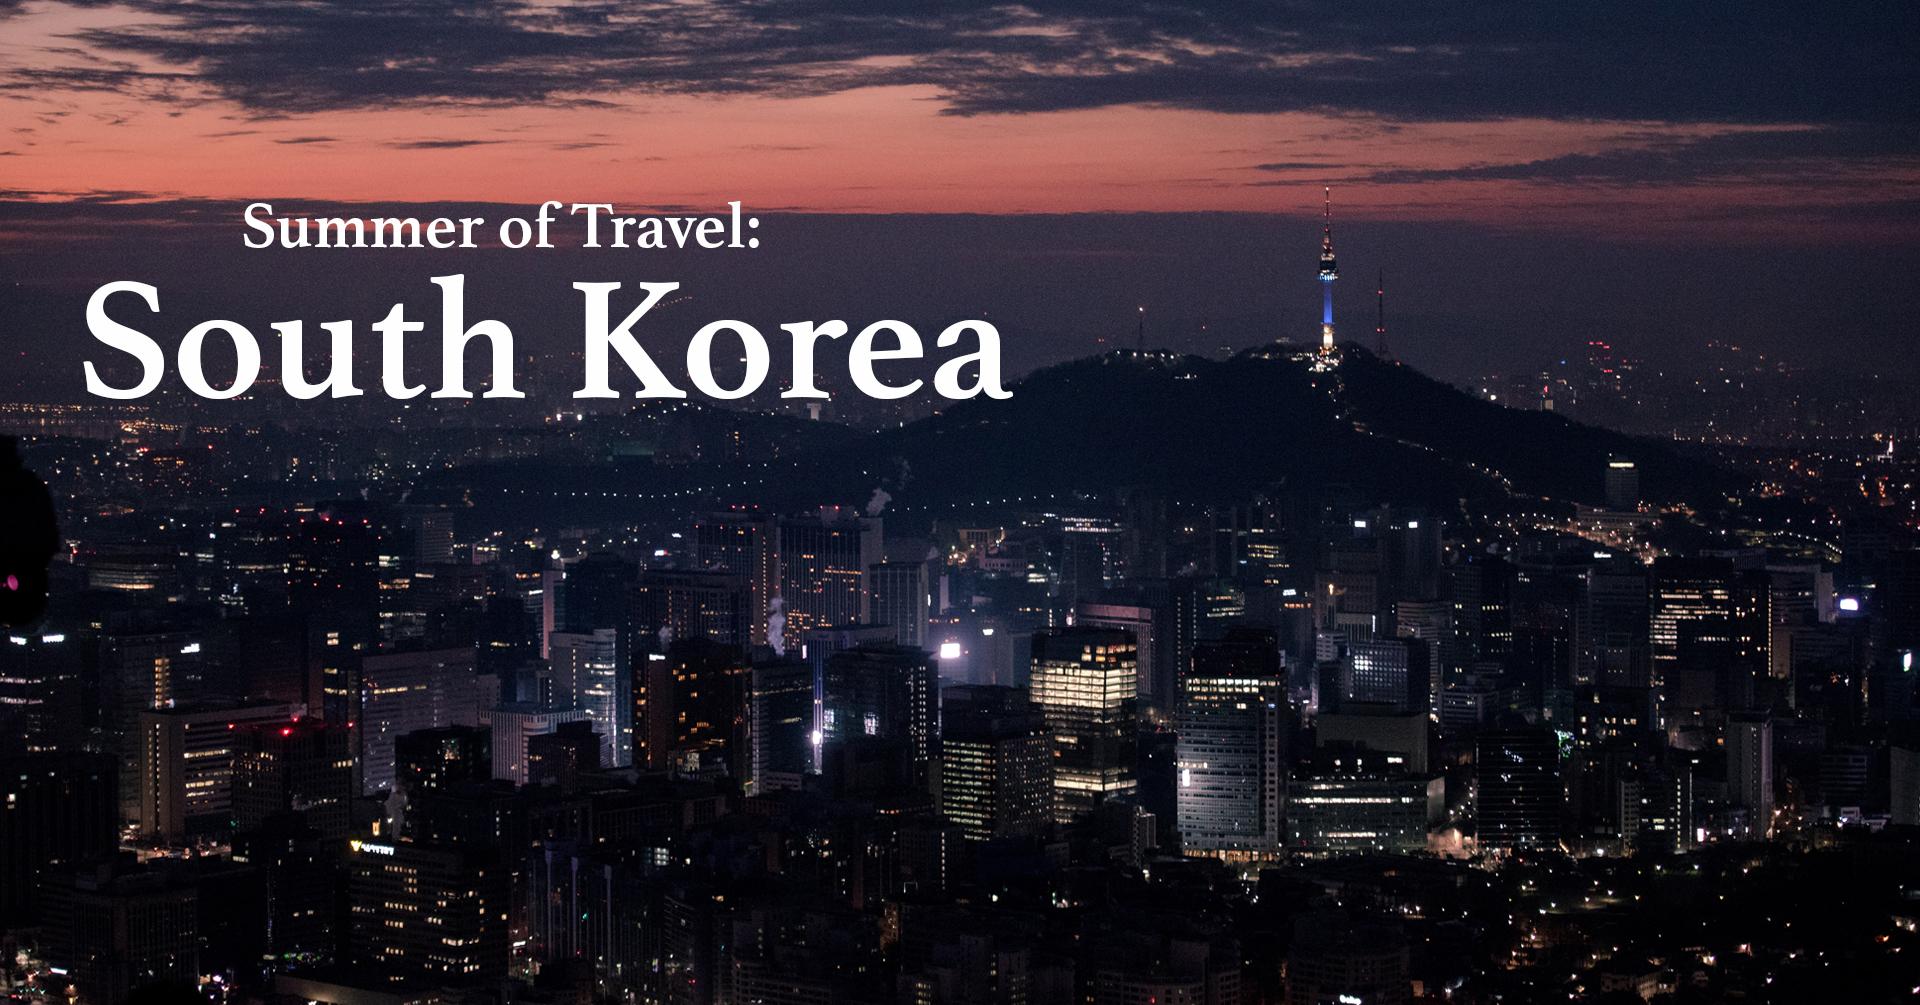 An image of Seoul, South Korea, with